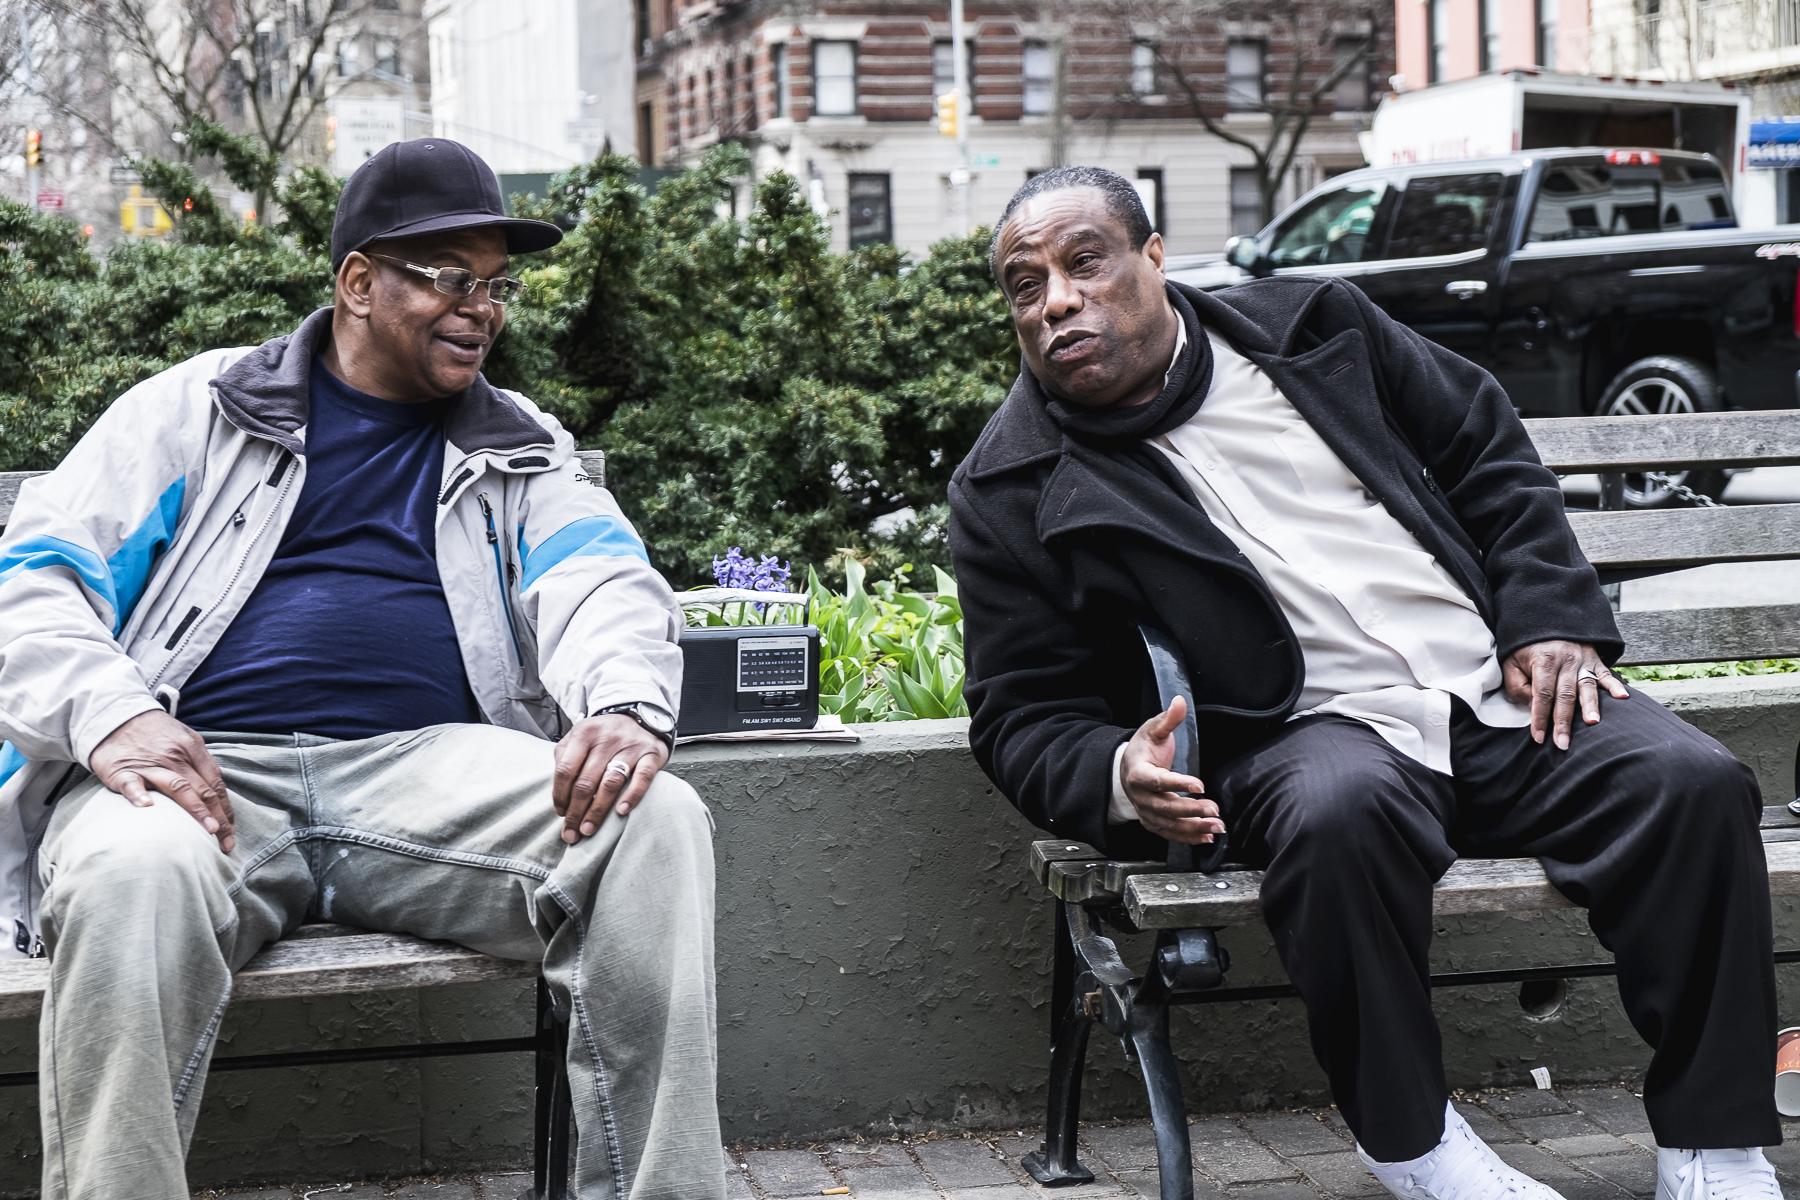 Harlem, Streetphotography New York / Zaragoza Walkers